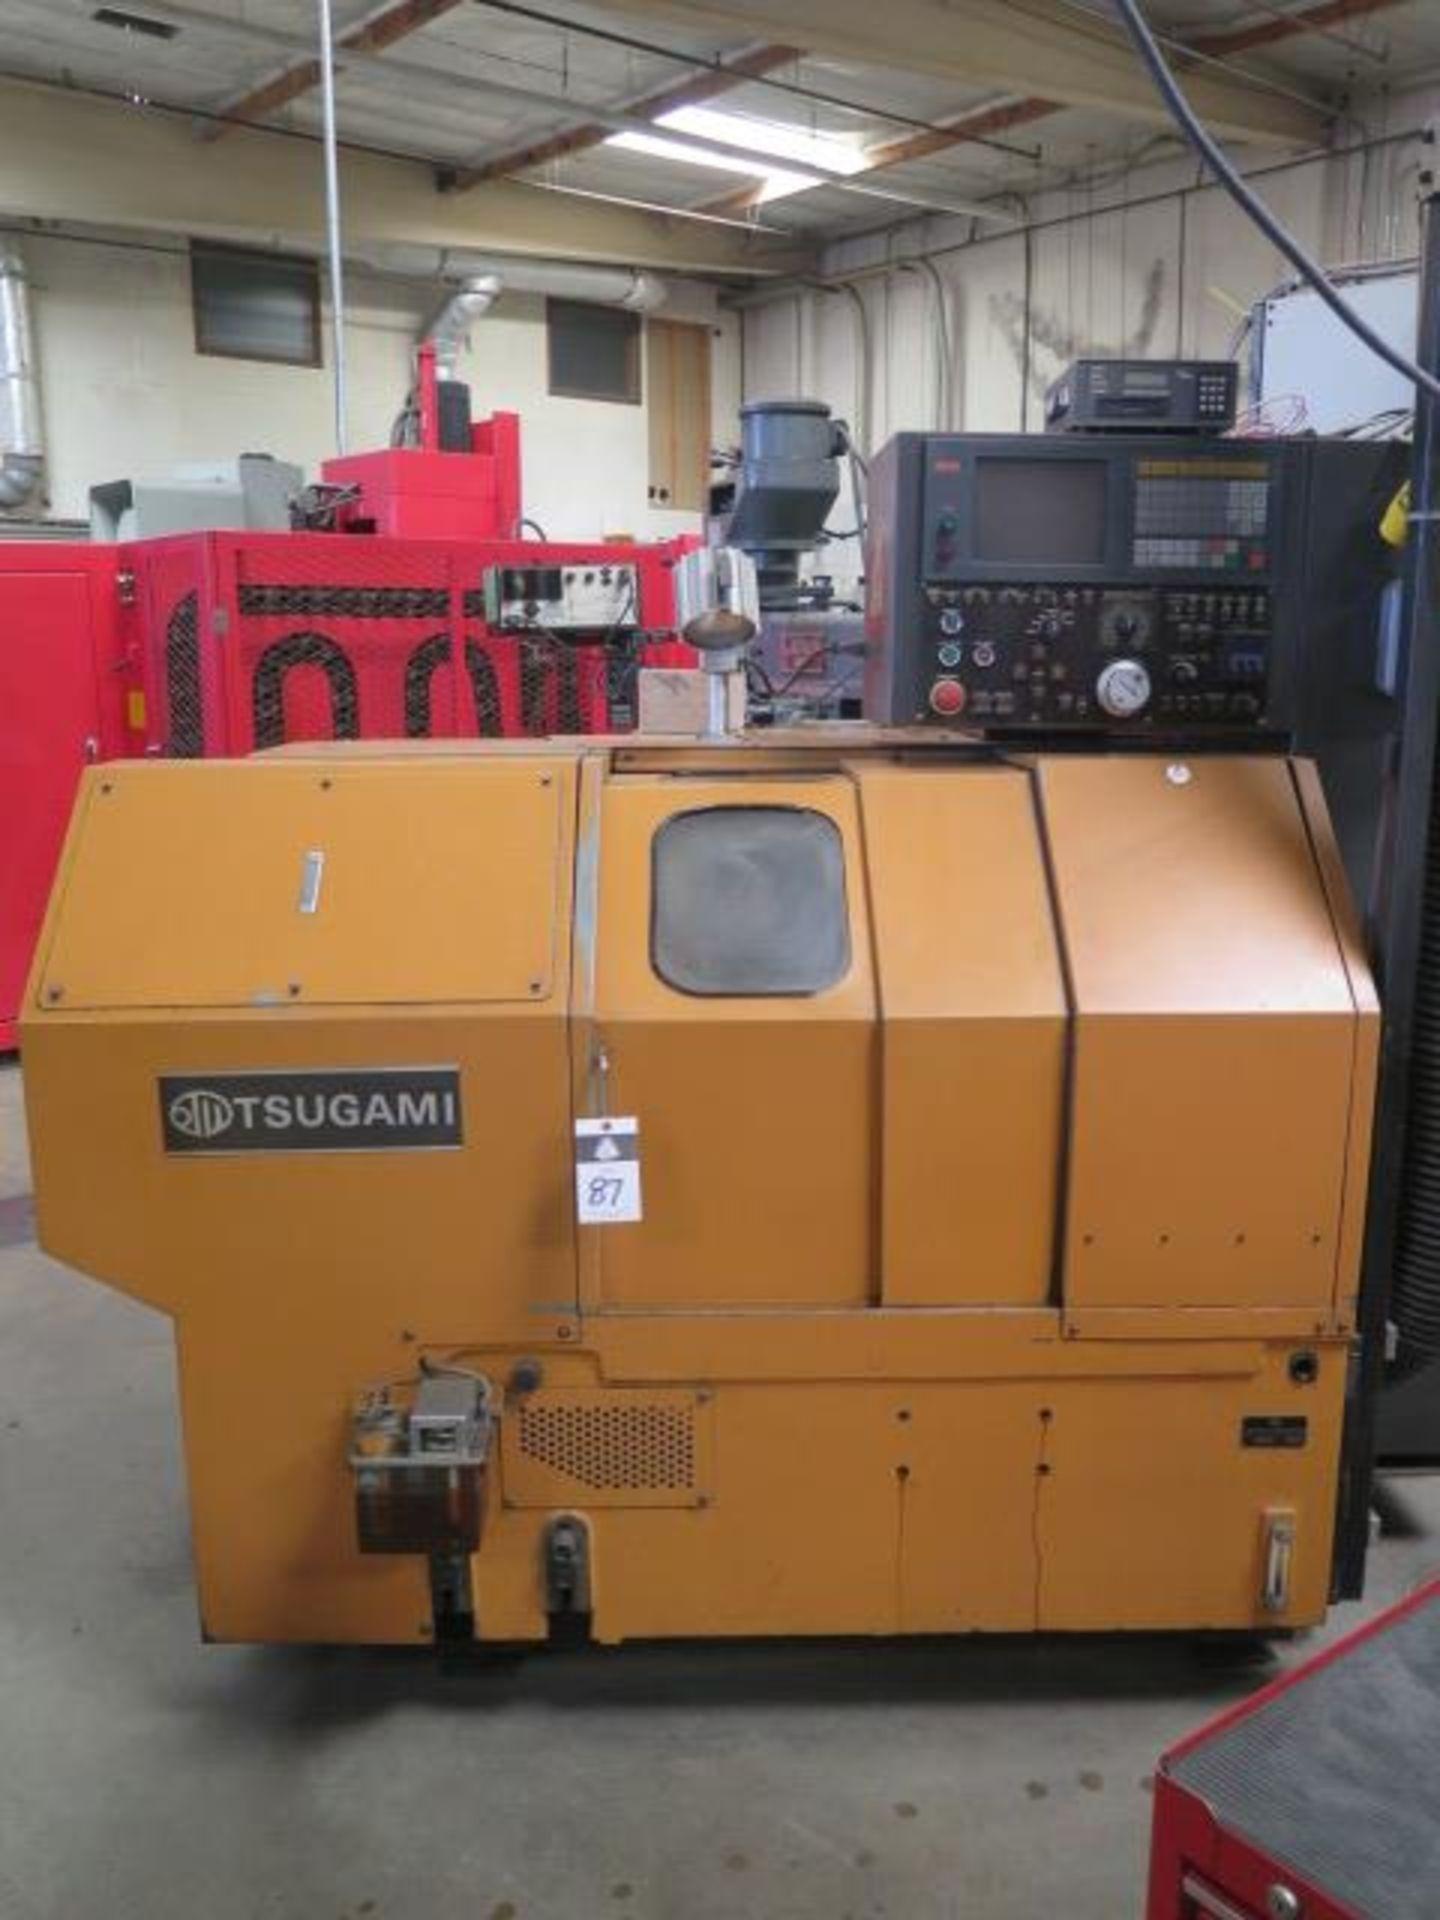 Tsugami NM3 CNC Turning Center s/n 6029 w/ Mitsubishi Meldas Controls, 8-Station Turret, SOLD AS IS